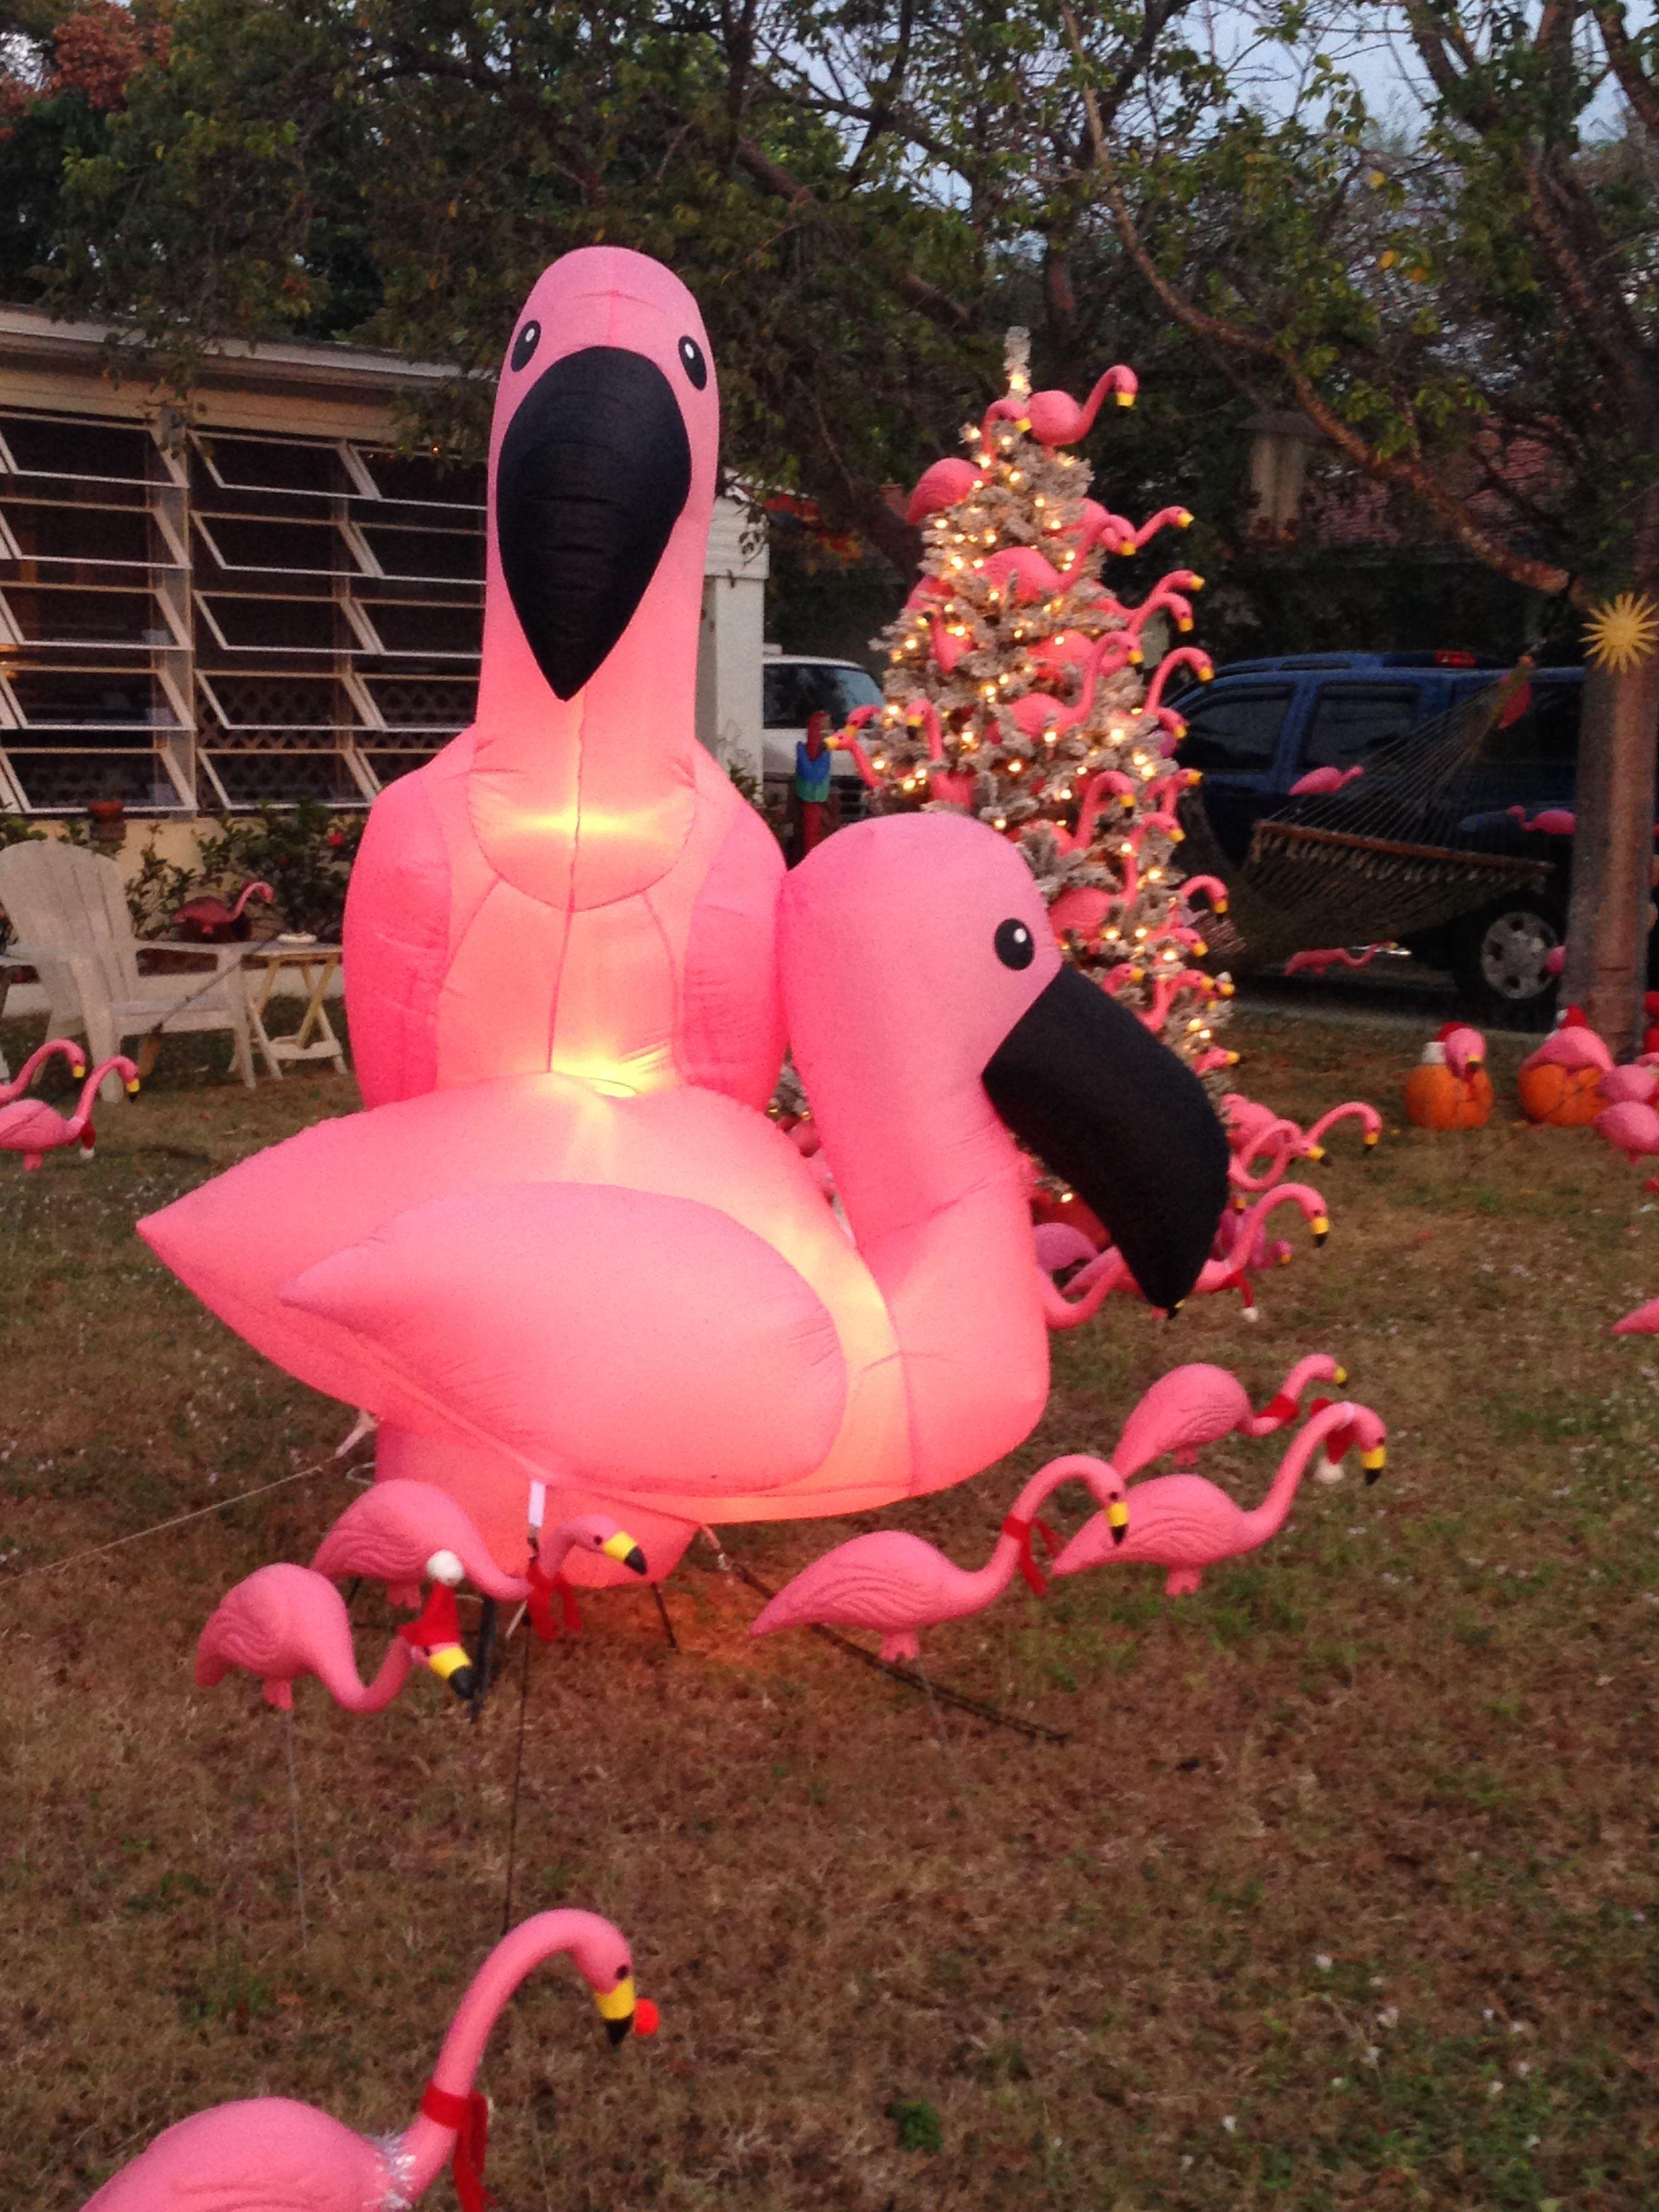 Flamingo Christmas Lawn Decor Flamingos Love Them